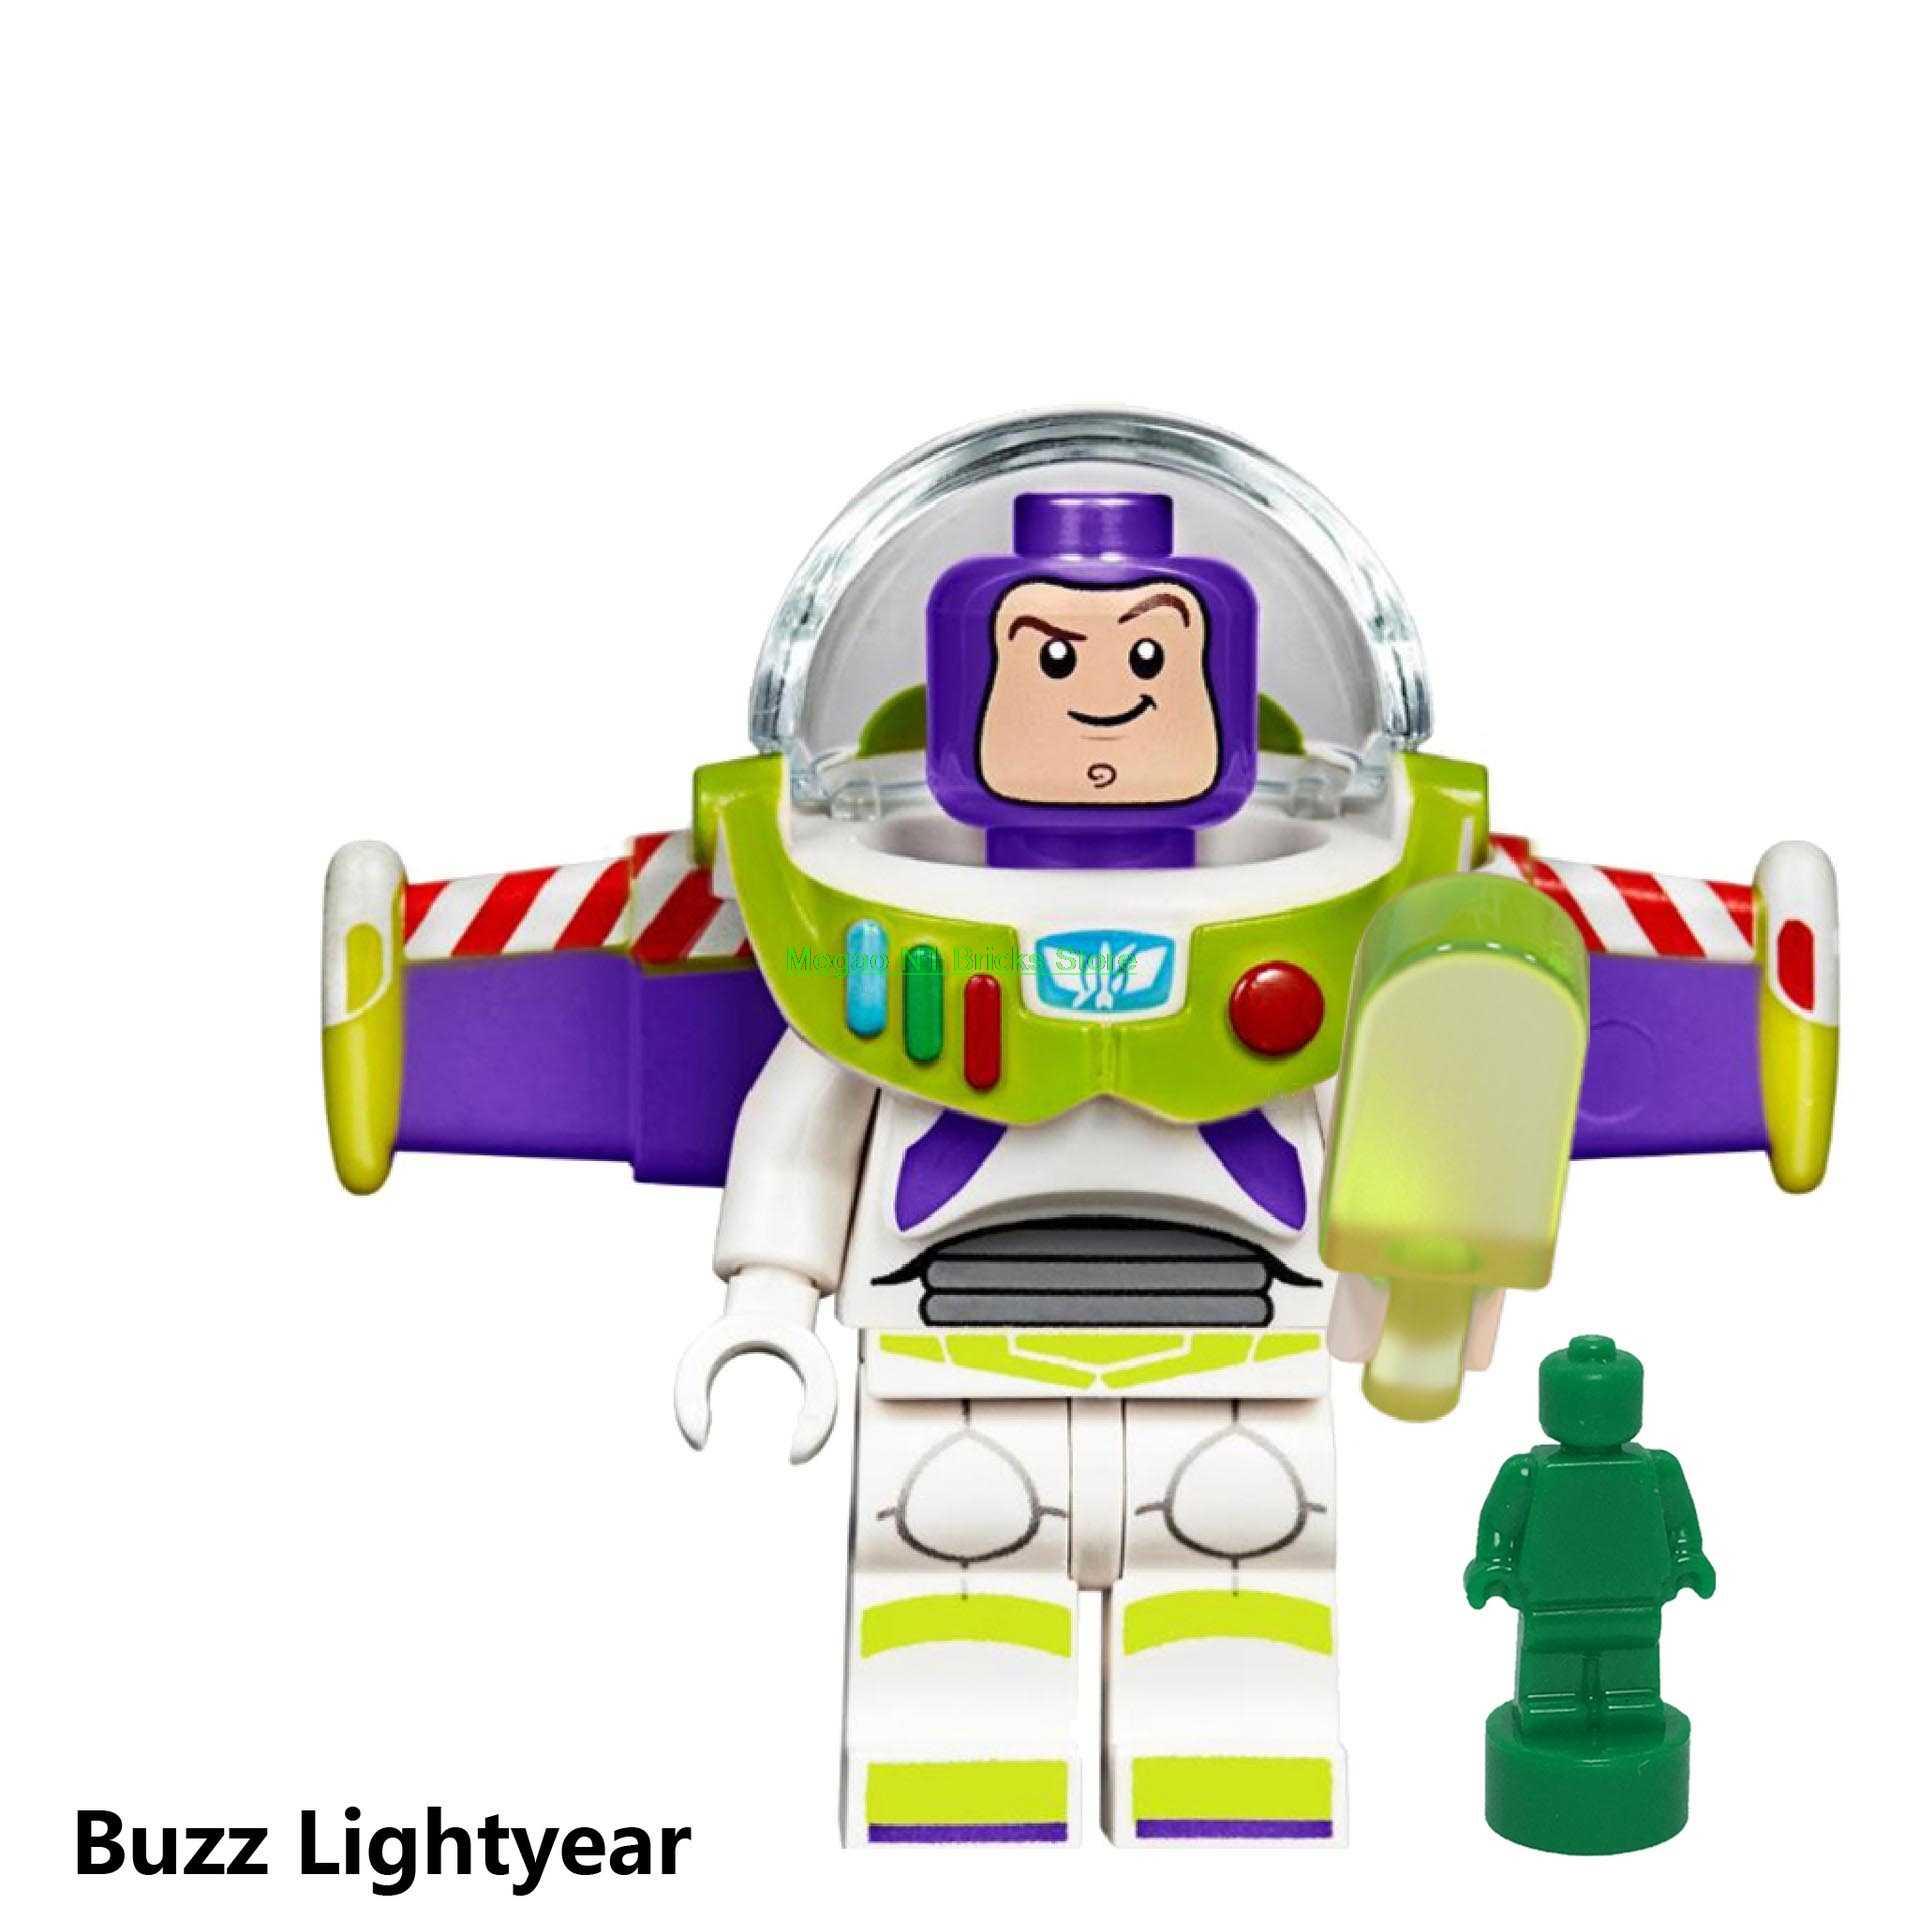 Untuk Mainan Cerita Angka Buzz Lightyear Woody Forky Gremlins Alat Stitch Jessie Alien dengan Elliot Blok Bangunan Teman-teman Batu Bata